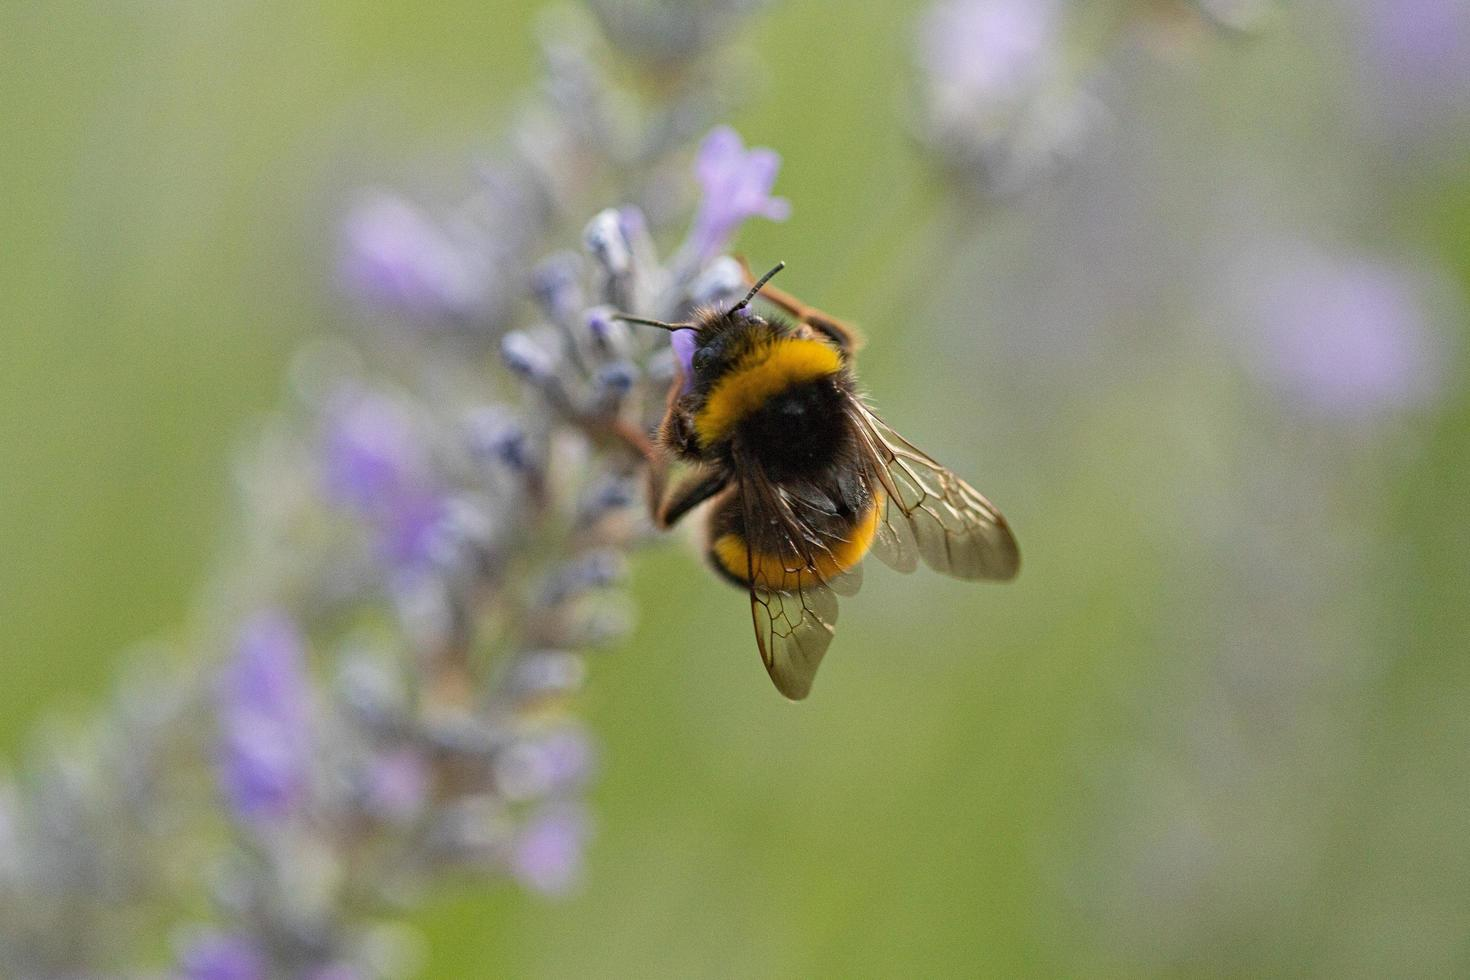 une abeille pollinisatrice de lavande photo